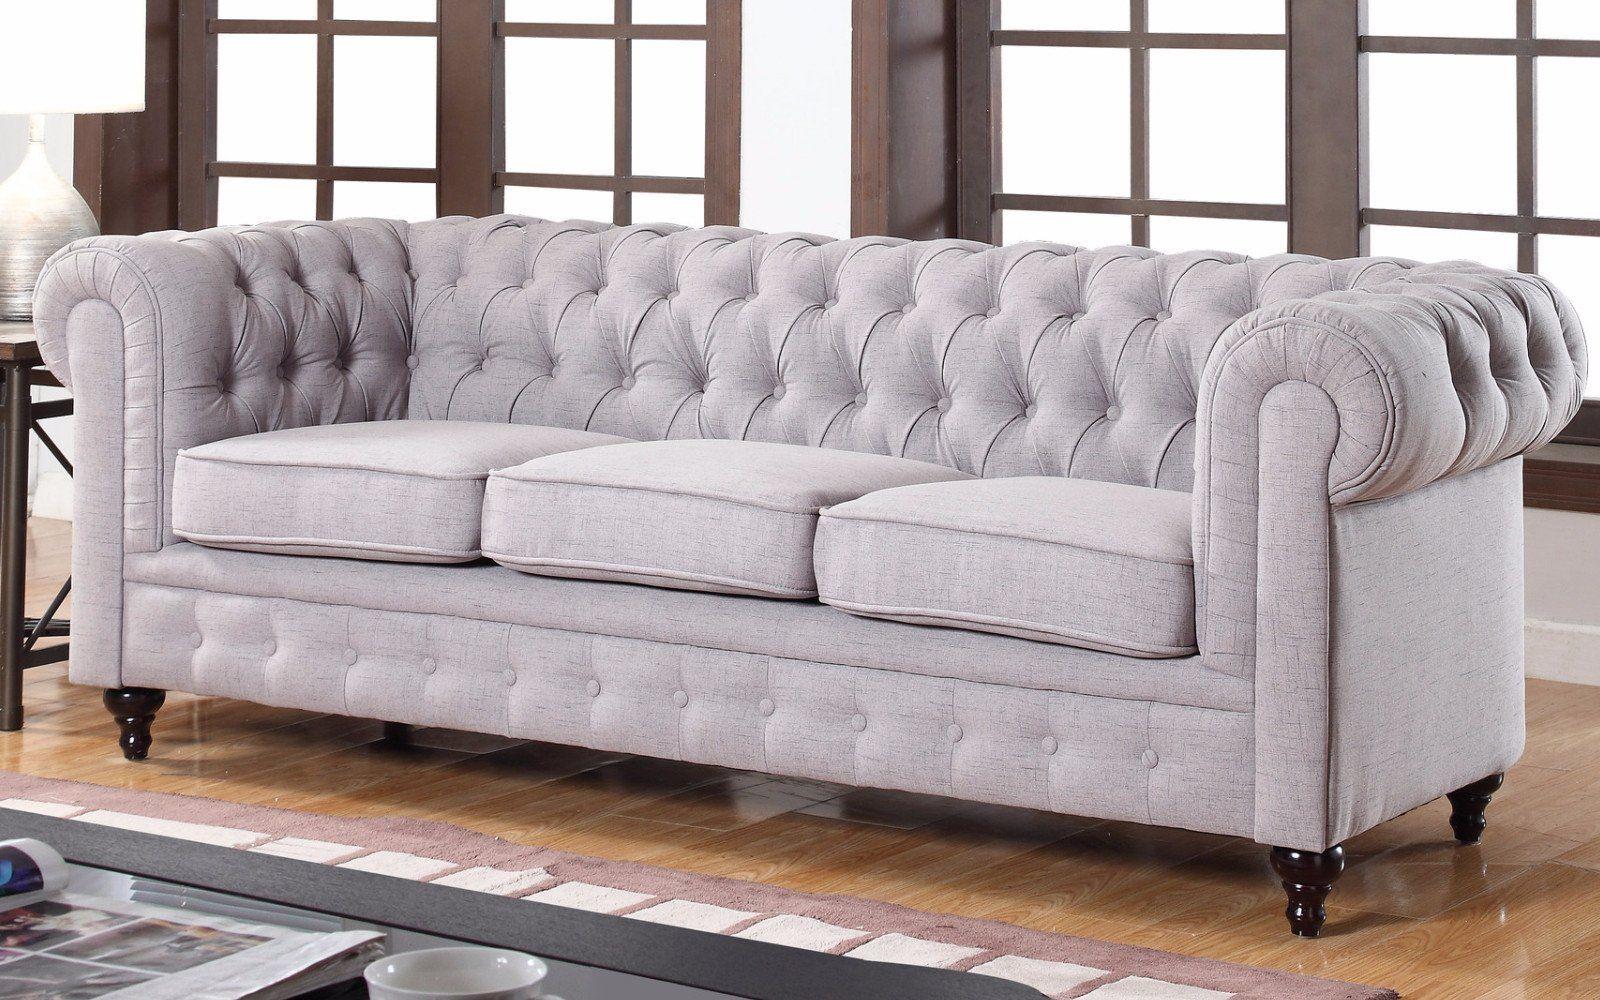 Charleston Classic Chesterfield Linen Sofa Chesterfield Style Sofa Fabric Chesterfield Sofa Furniture